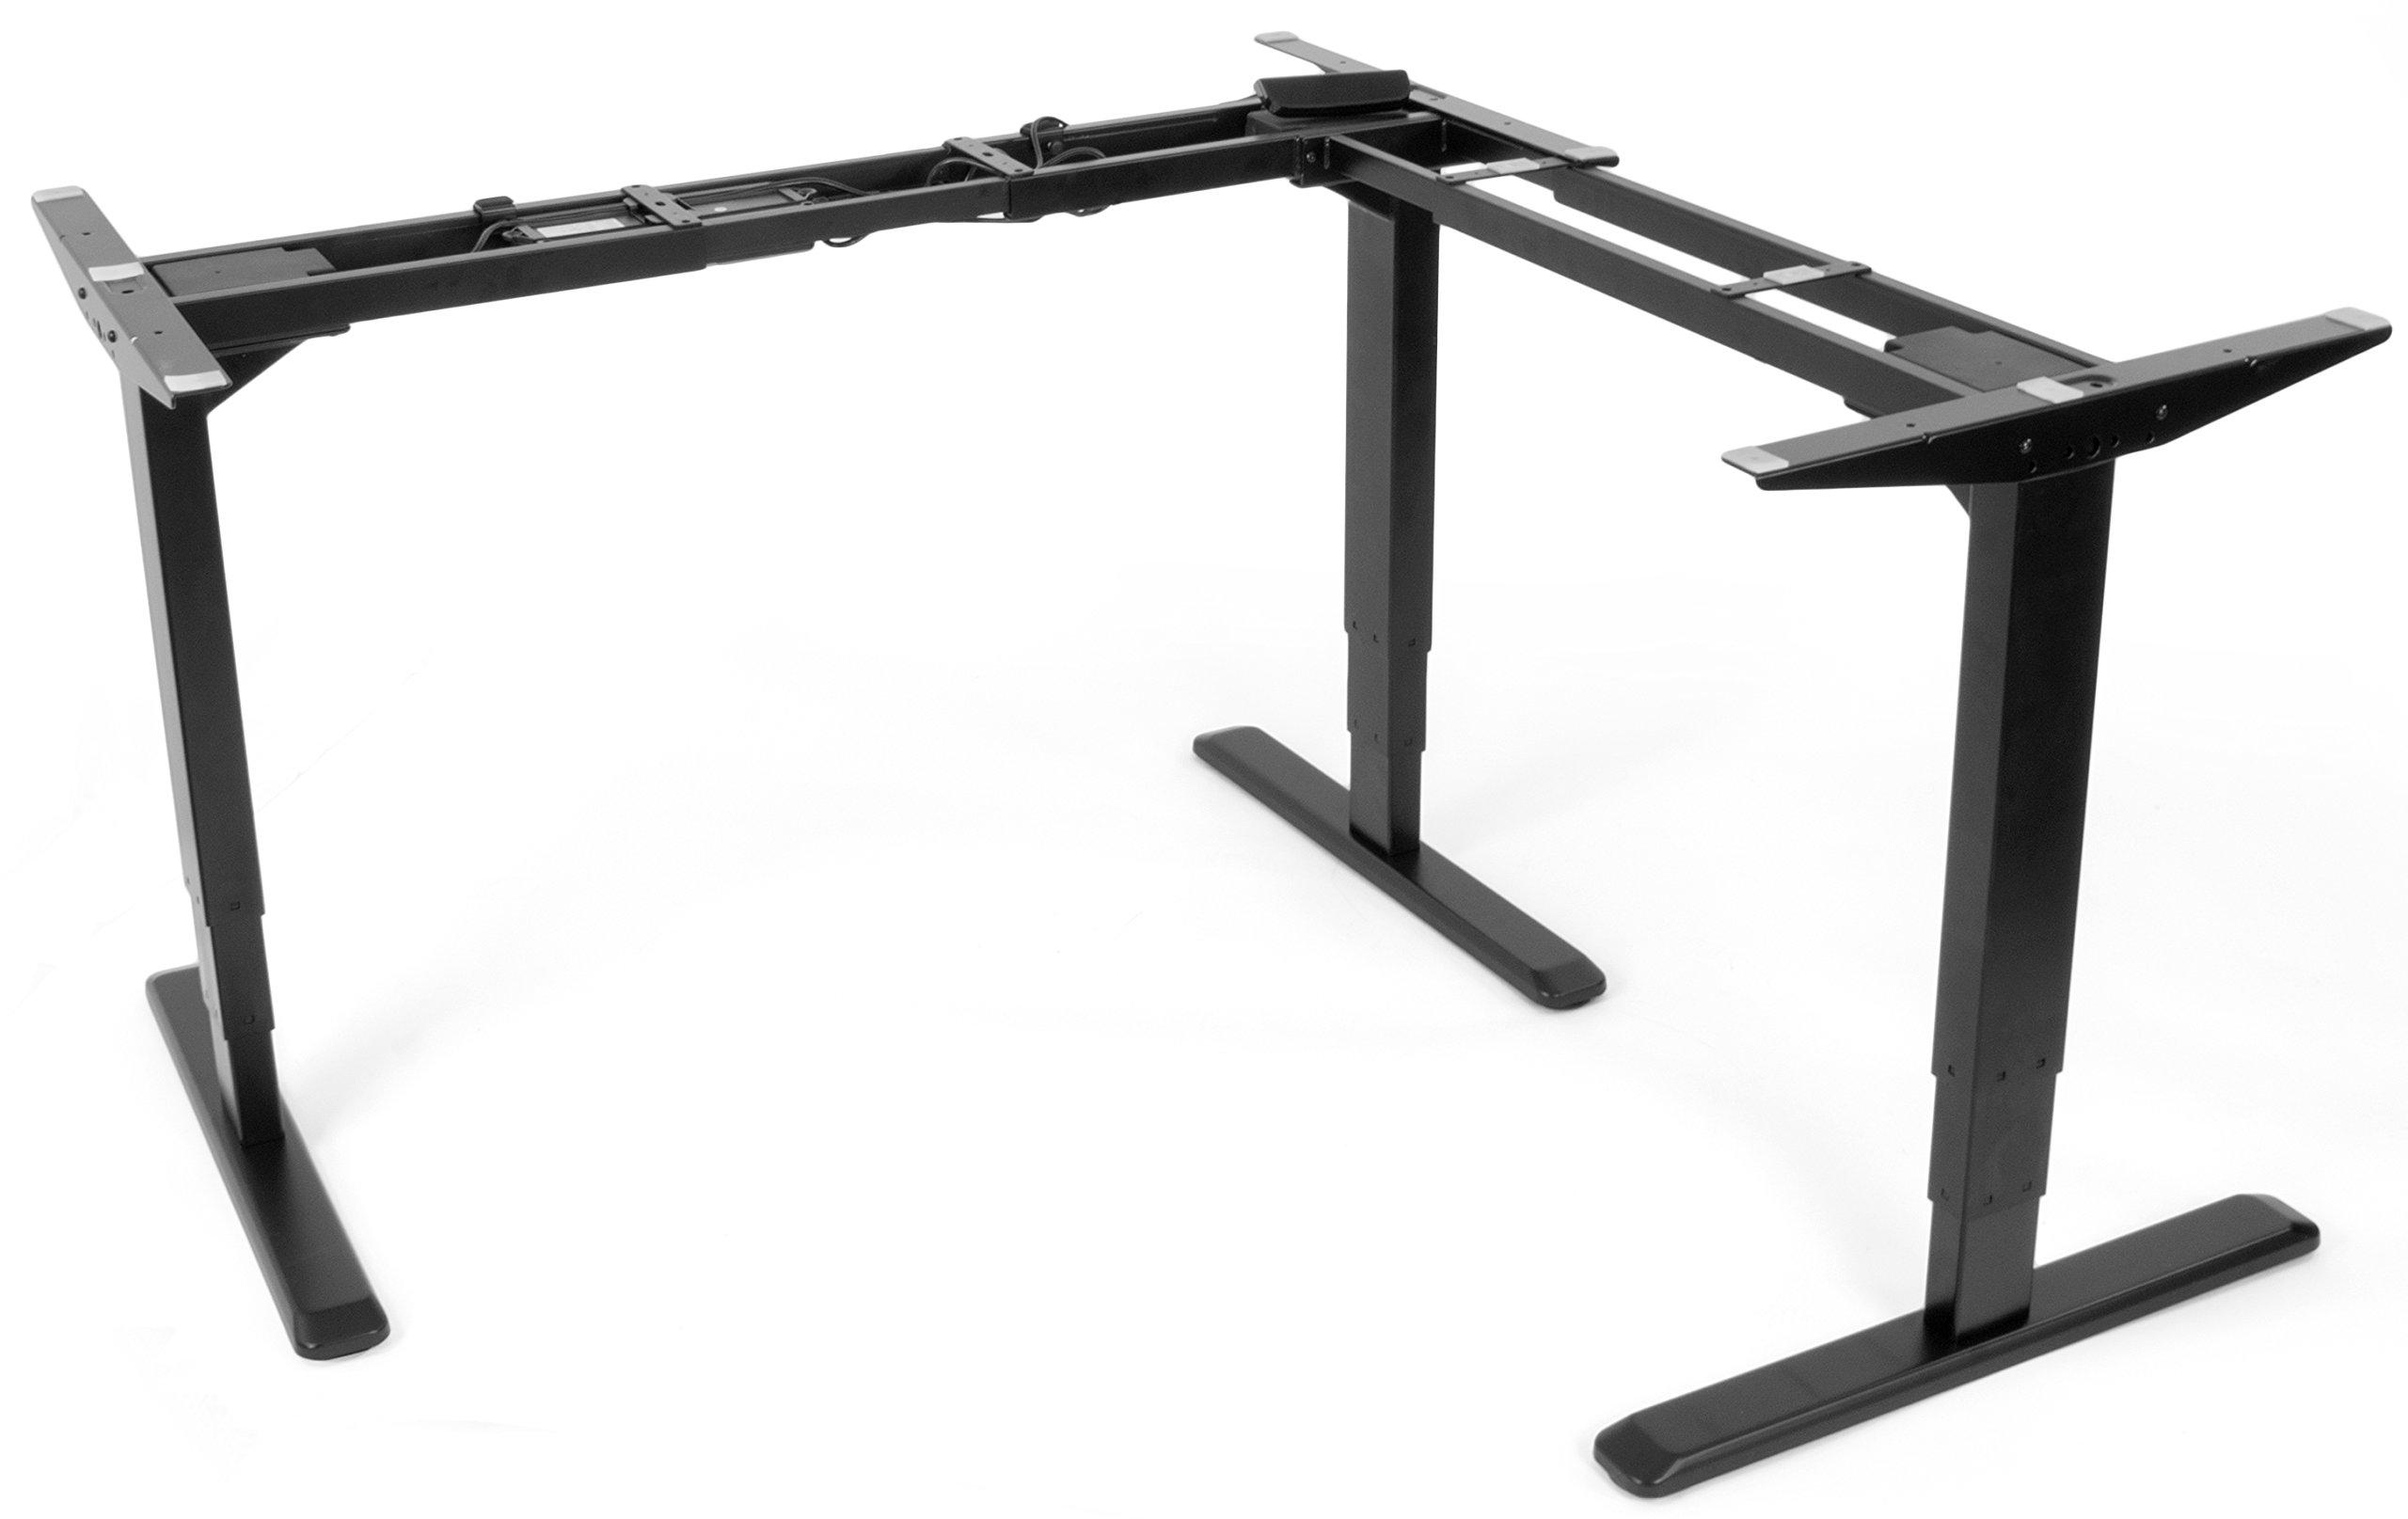 VIVO Electric Motor Sit Standing Height Adjustable Corner Three Leg Desk (Frame only) Stand Ergonomic L Frame (DESK-V133E)